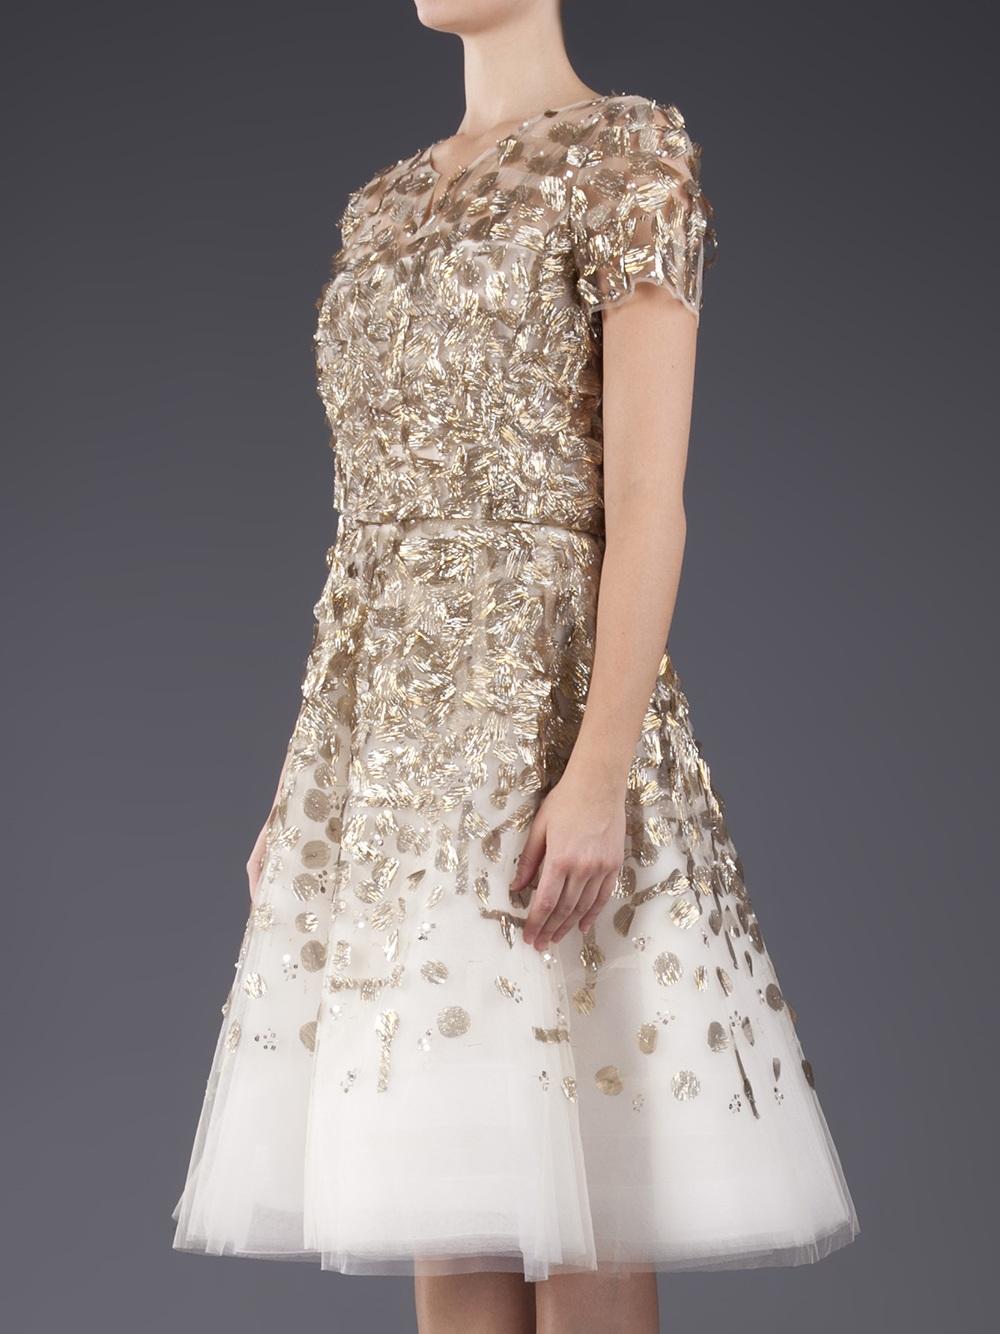 Embellished Tail Dress